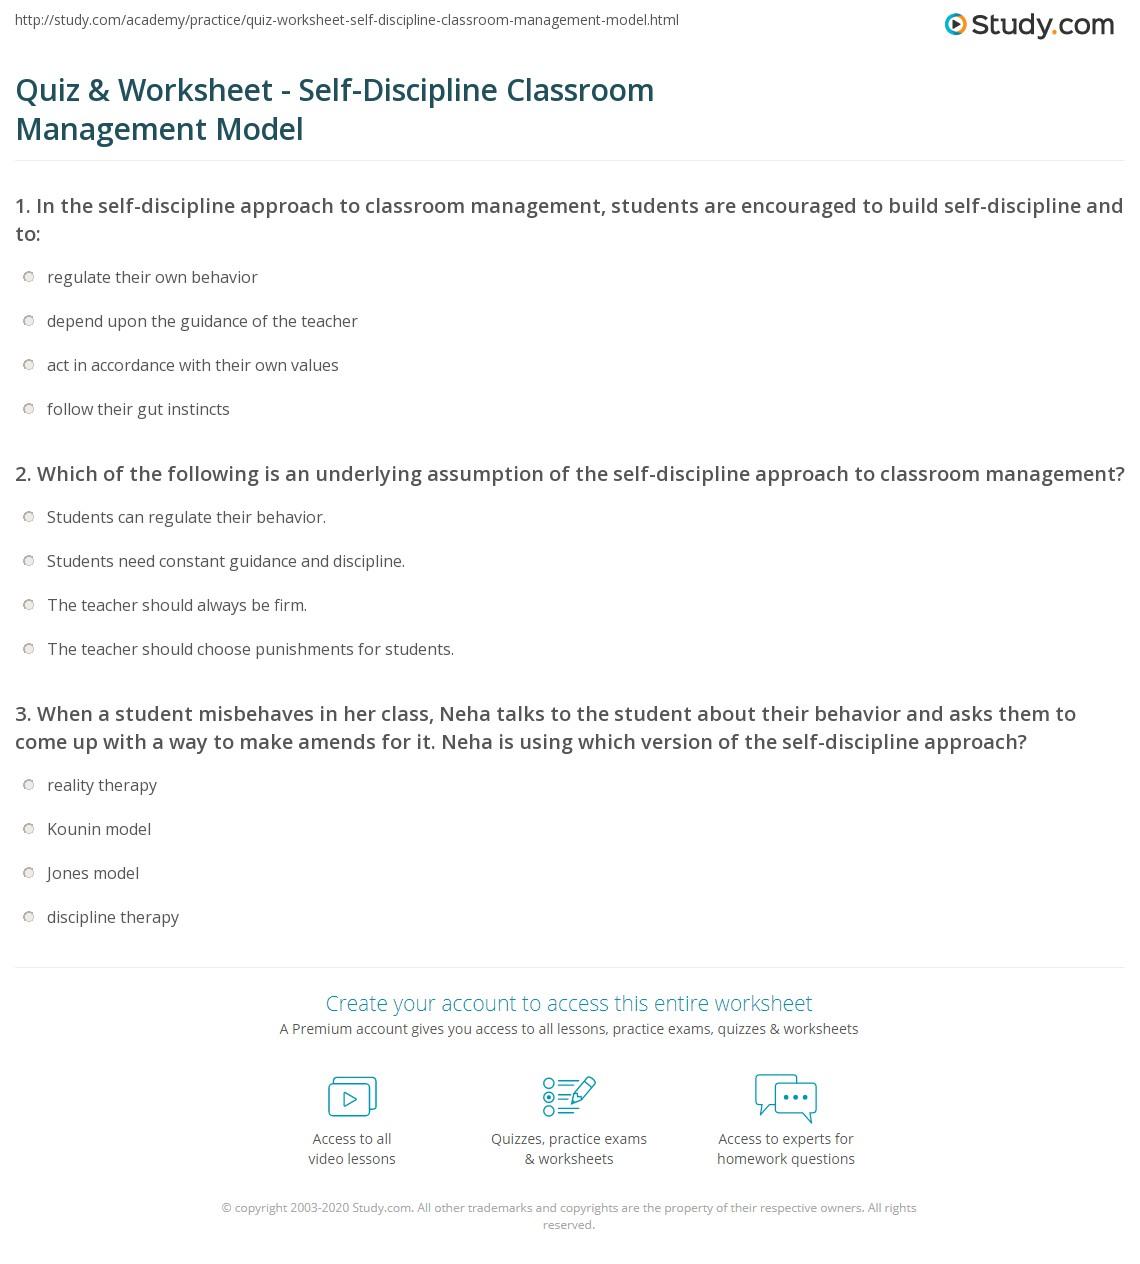 A Values Based Approach To Discipline >> Quiz Worksheet Self Discipline Classroom Management Model